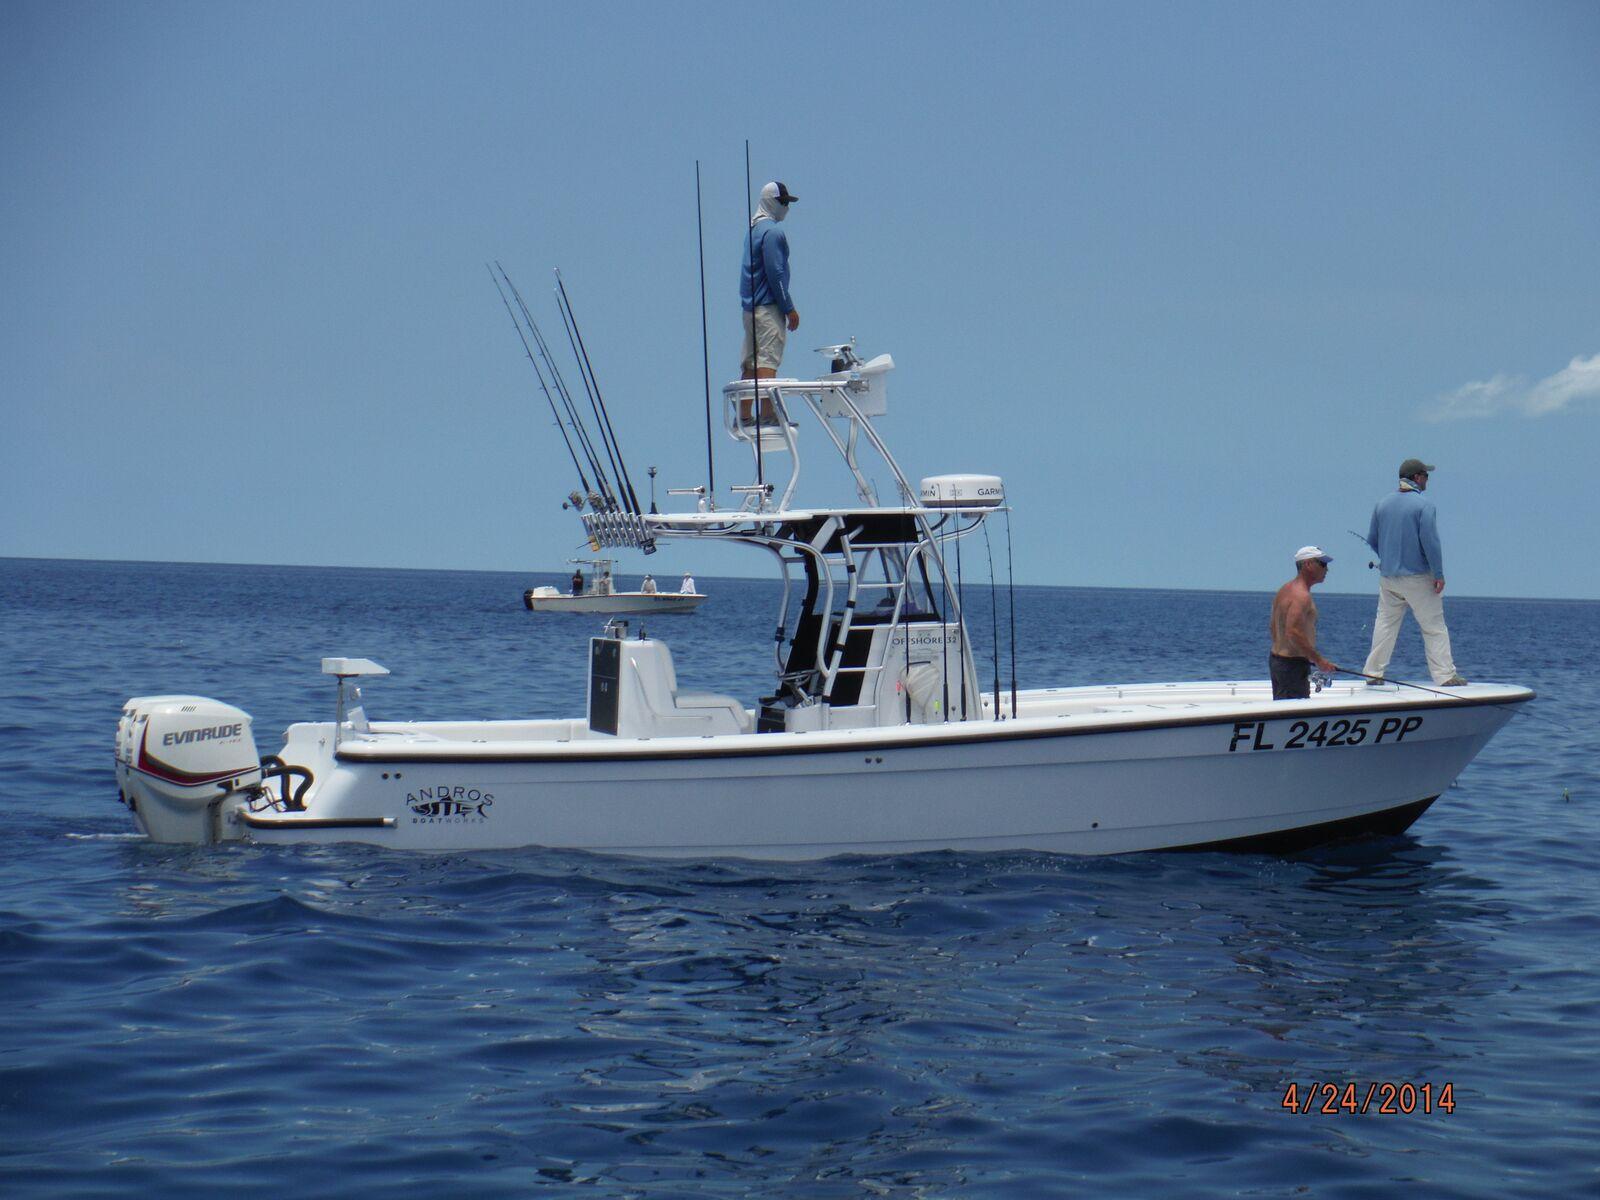 Odyssea odyssea key west sportfishing for Key west fishing boats